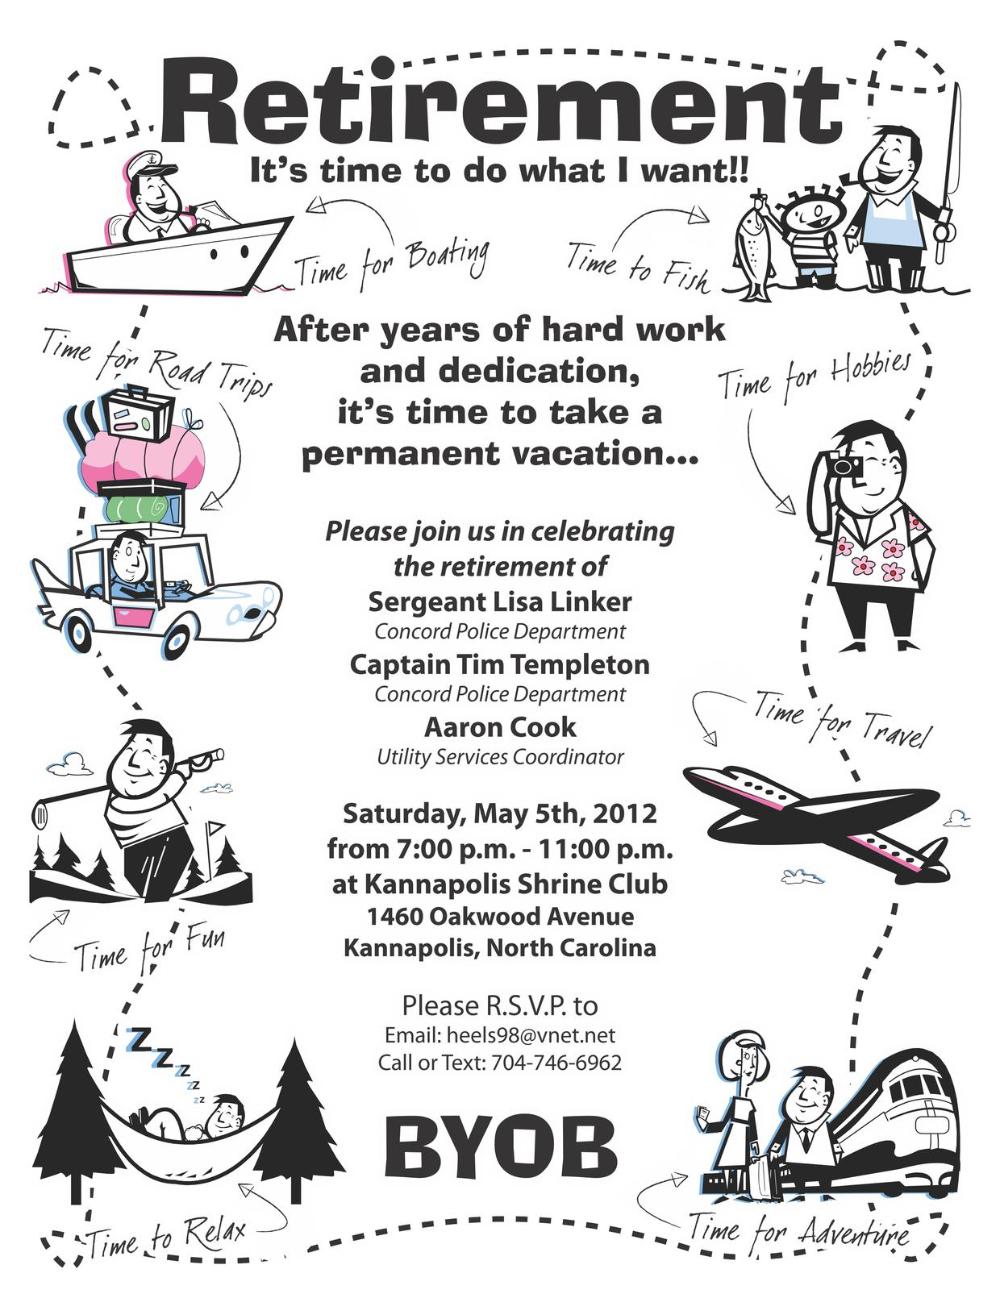 Retirement Party Invitation Wording For Nurses Party Invitati Retirement Party Invitations Retirement Party Invitation Wording Retirement Invitation Template